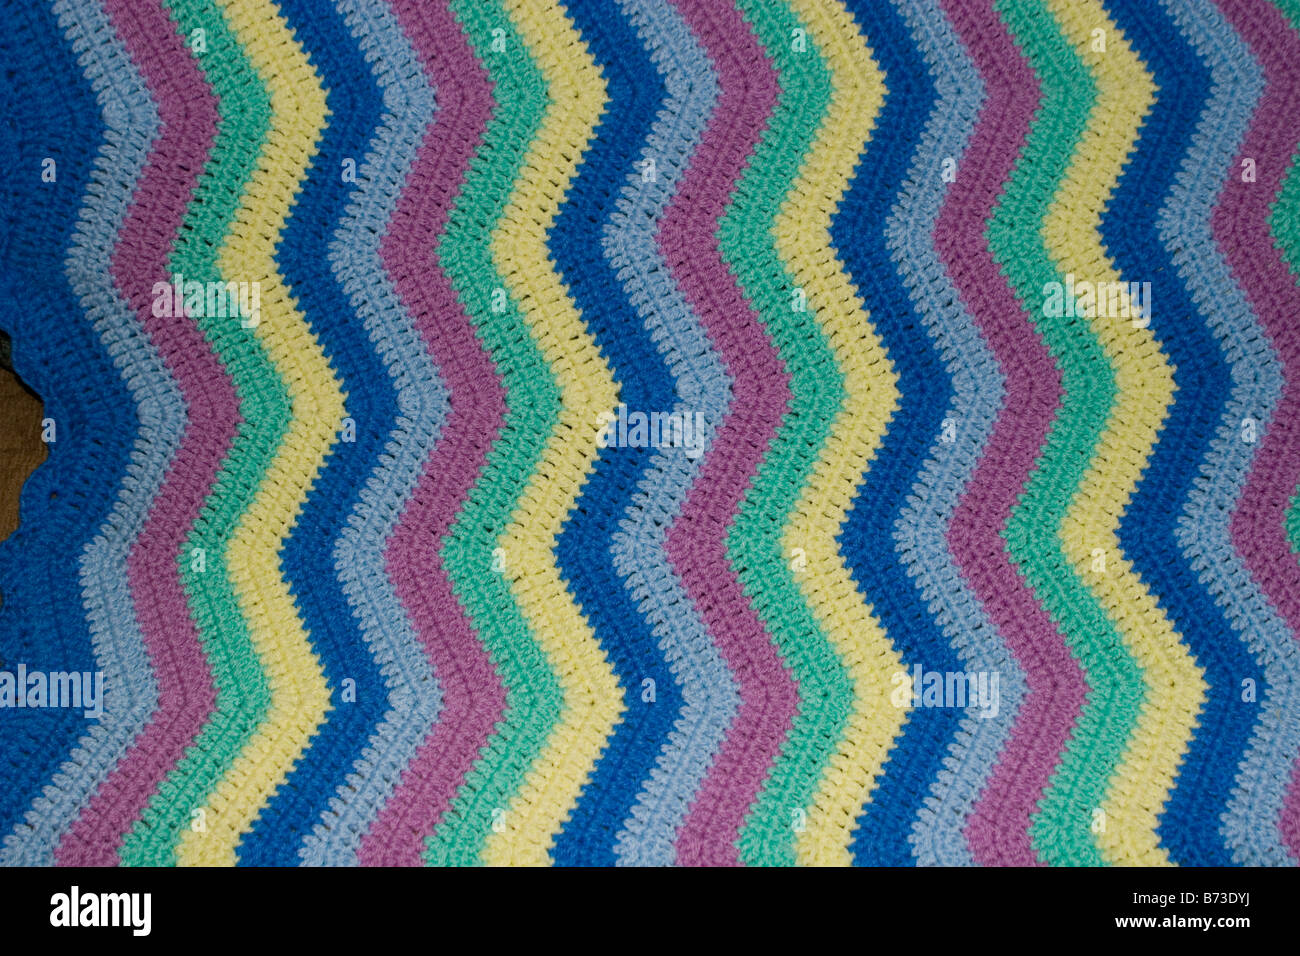 Closeup Häkeln Zick Zack Verschiedene Multi Farbe Farbe Decke Textur